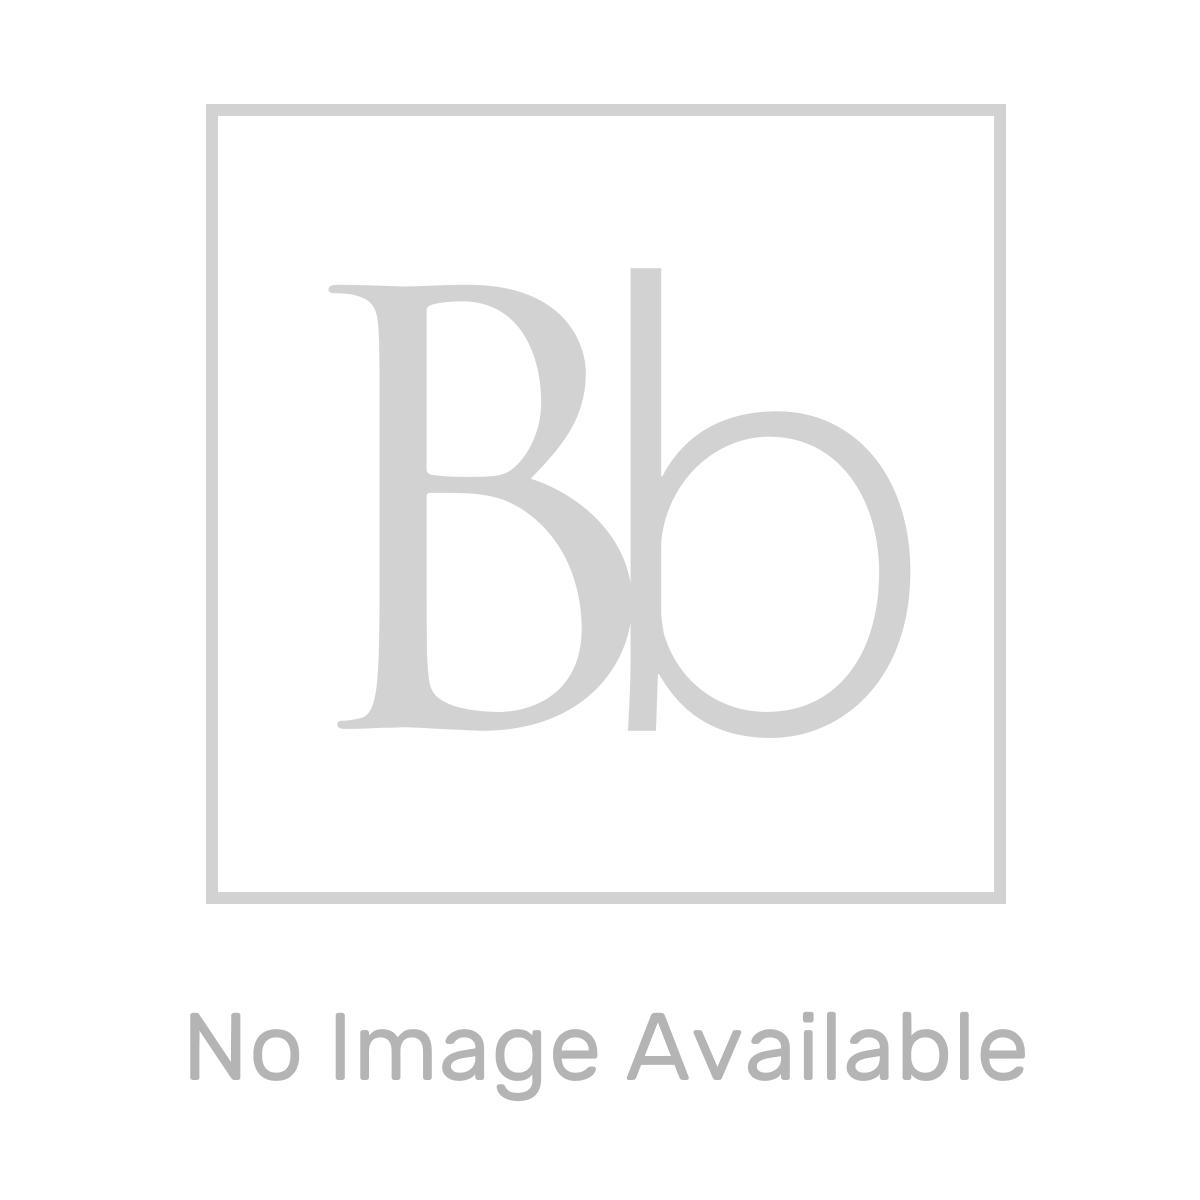 HIB Edge 120 Illuminated Cabinet 1200mm Drawing